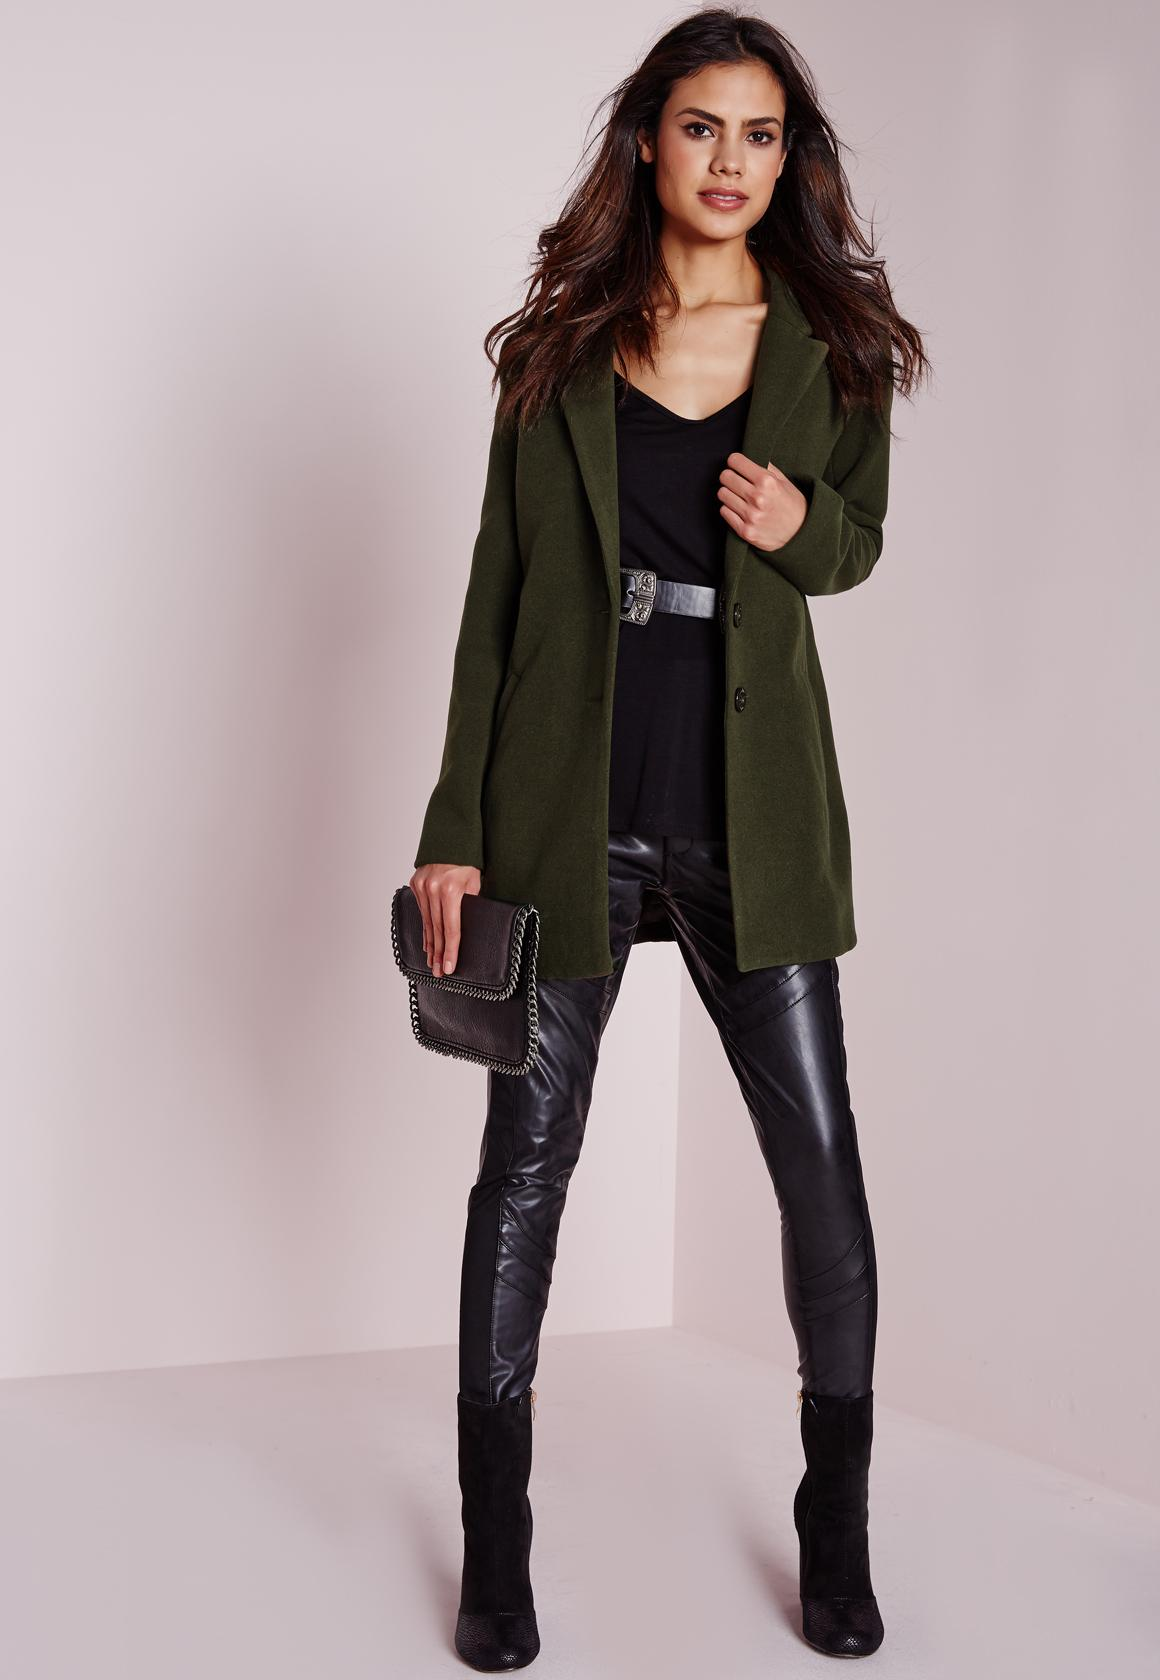 short faux wool coat khaki missguided #1: short faux wool coat khaki product page zoom 1x